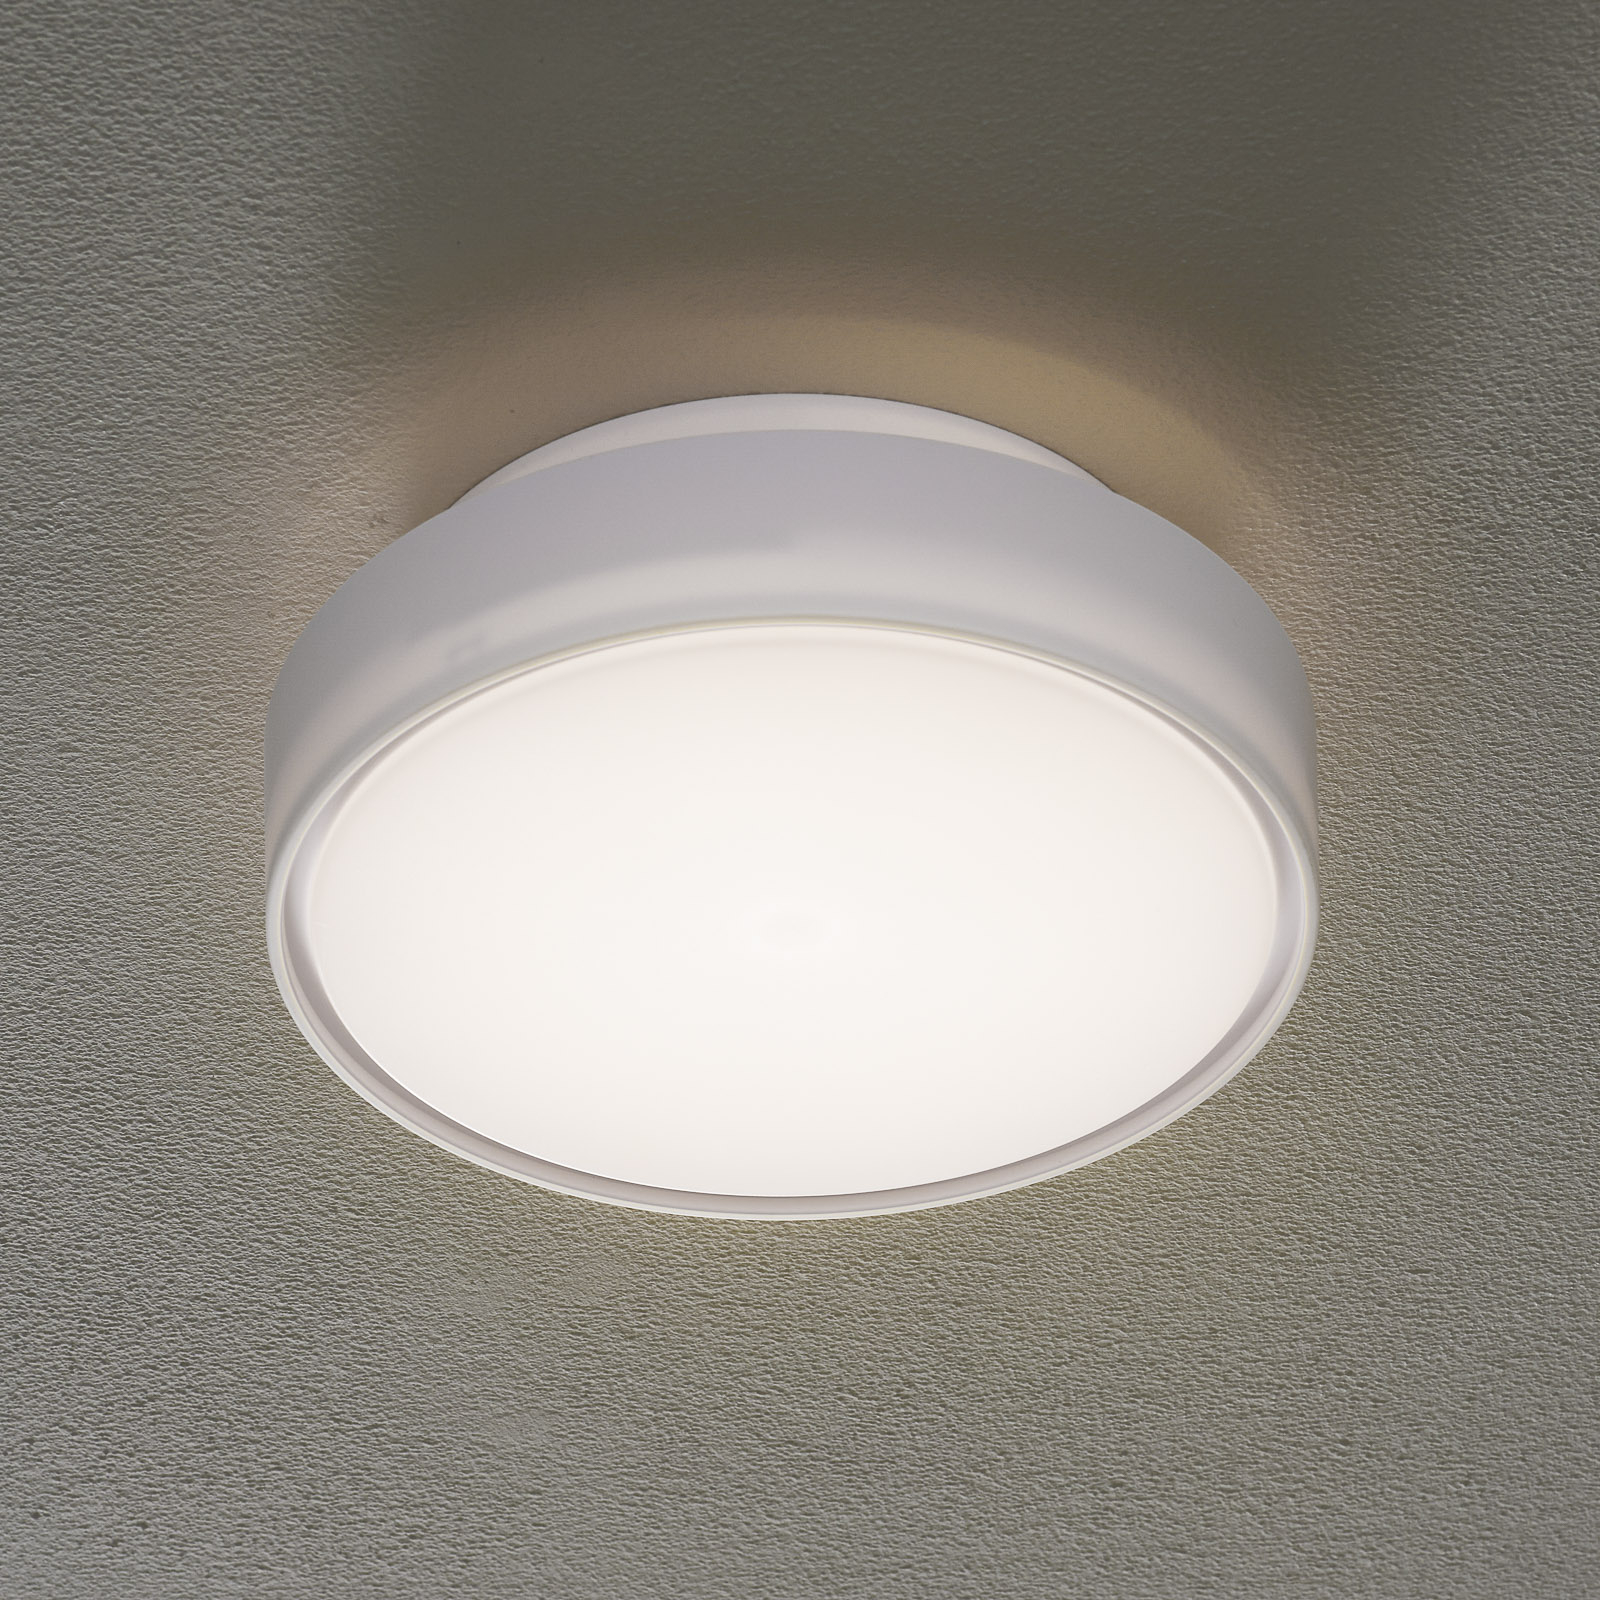 Lampa sufitowa LED Hatton IP65 25 cm